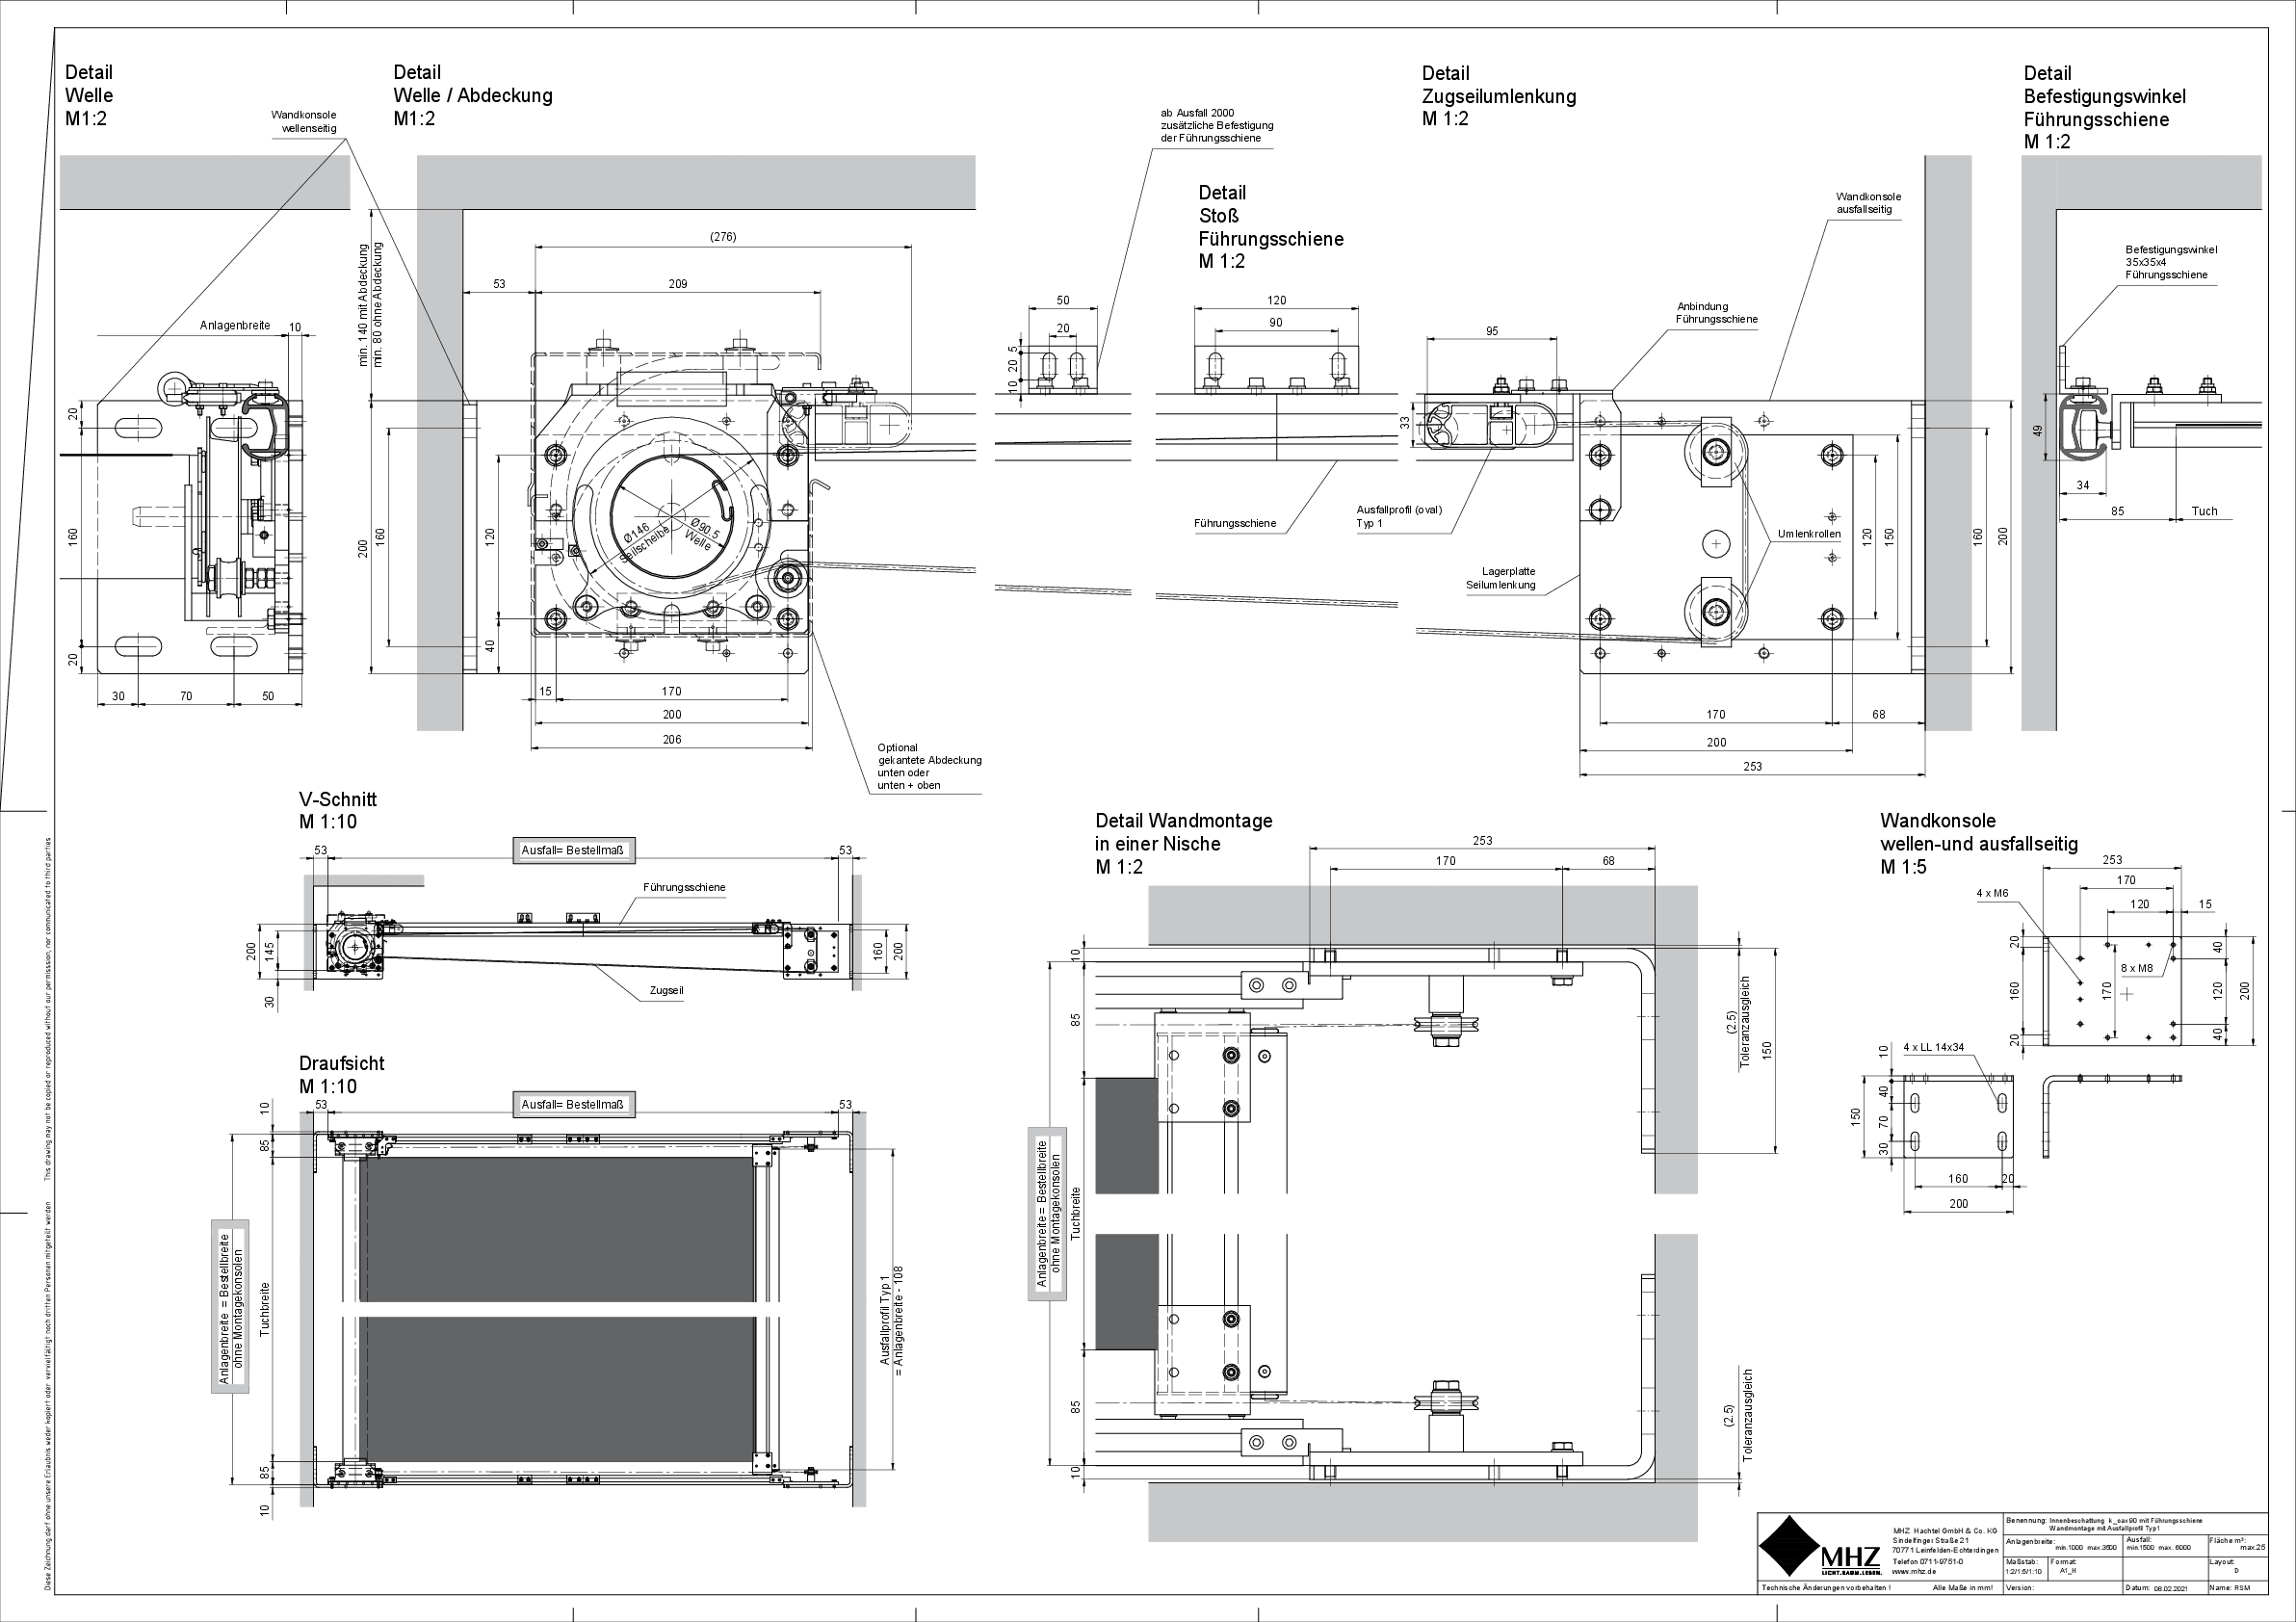 Technische Zeichnung Beschattung k_oax 90 (pdf)